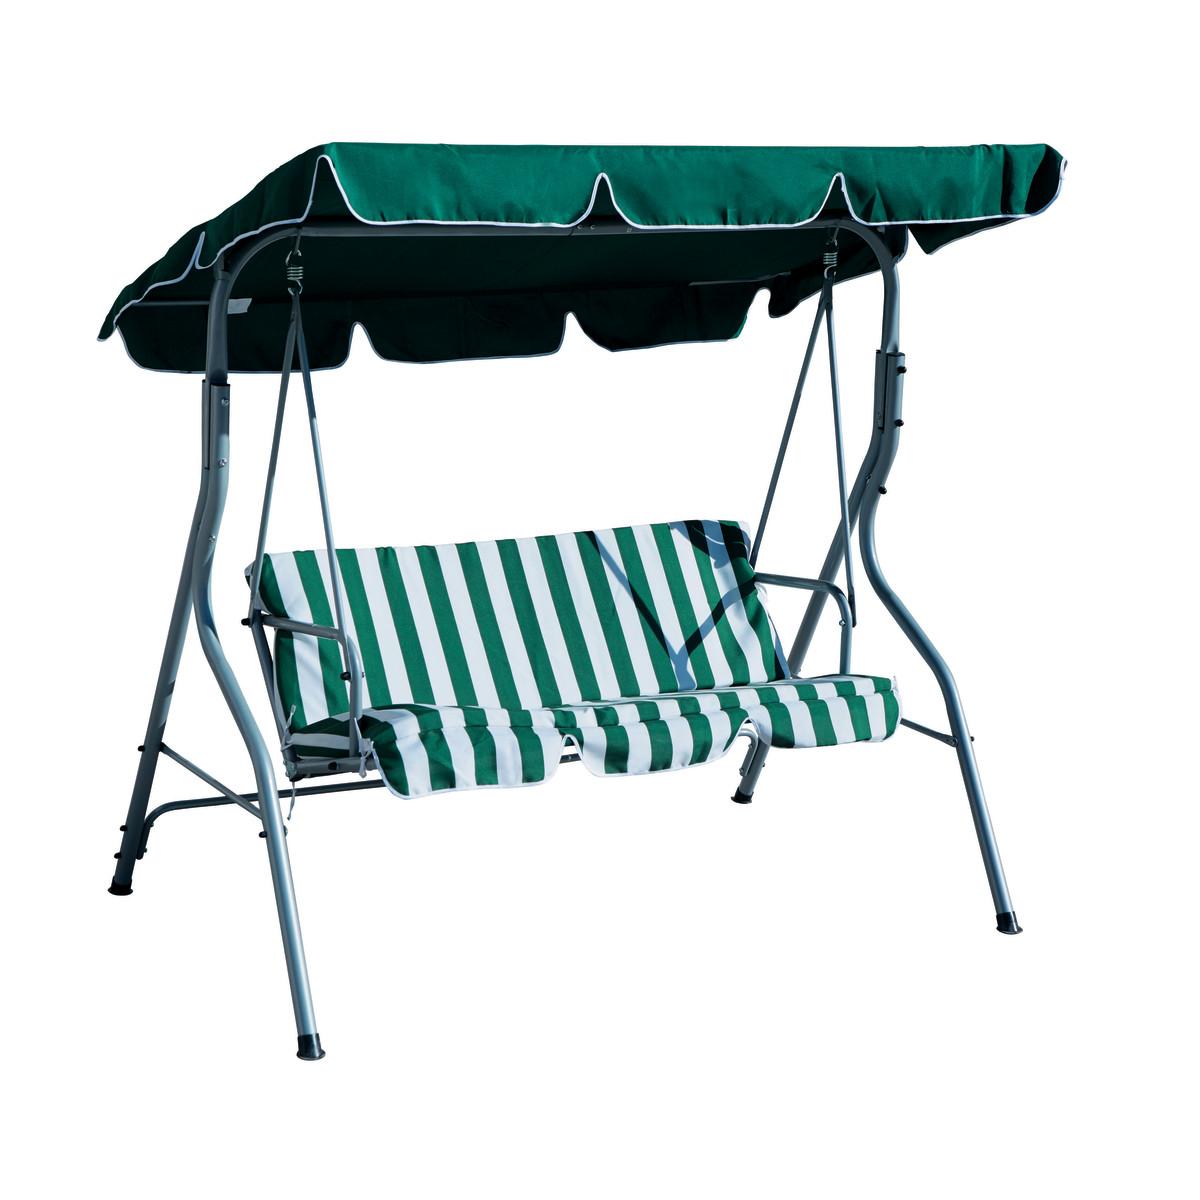 Leroy merlin mobili da giardino spugna per divani leroy for Leroy merlin dondolo